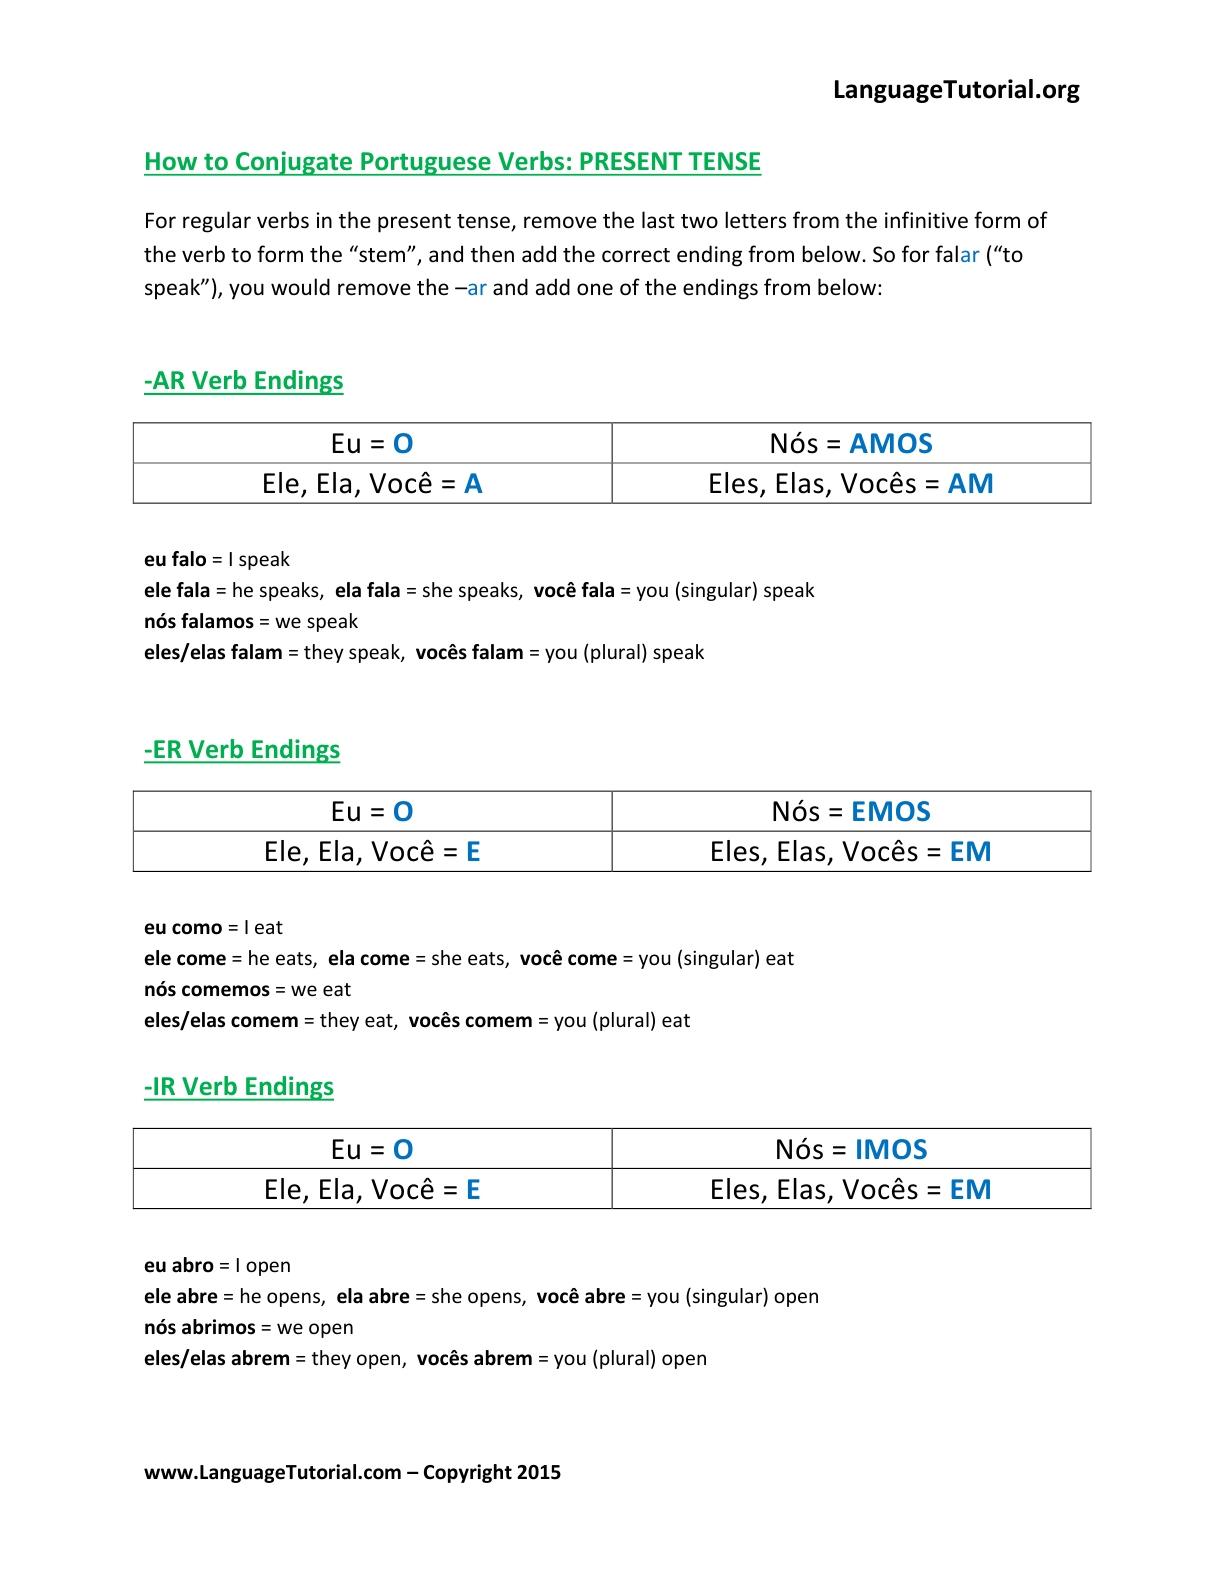 Free Portuguese Worksheets - Online & Printable | Free Printable Portuguese Worksheets